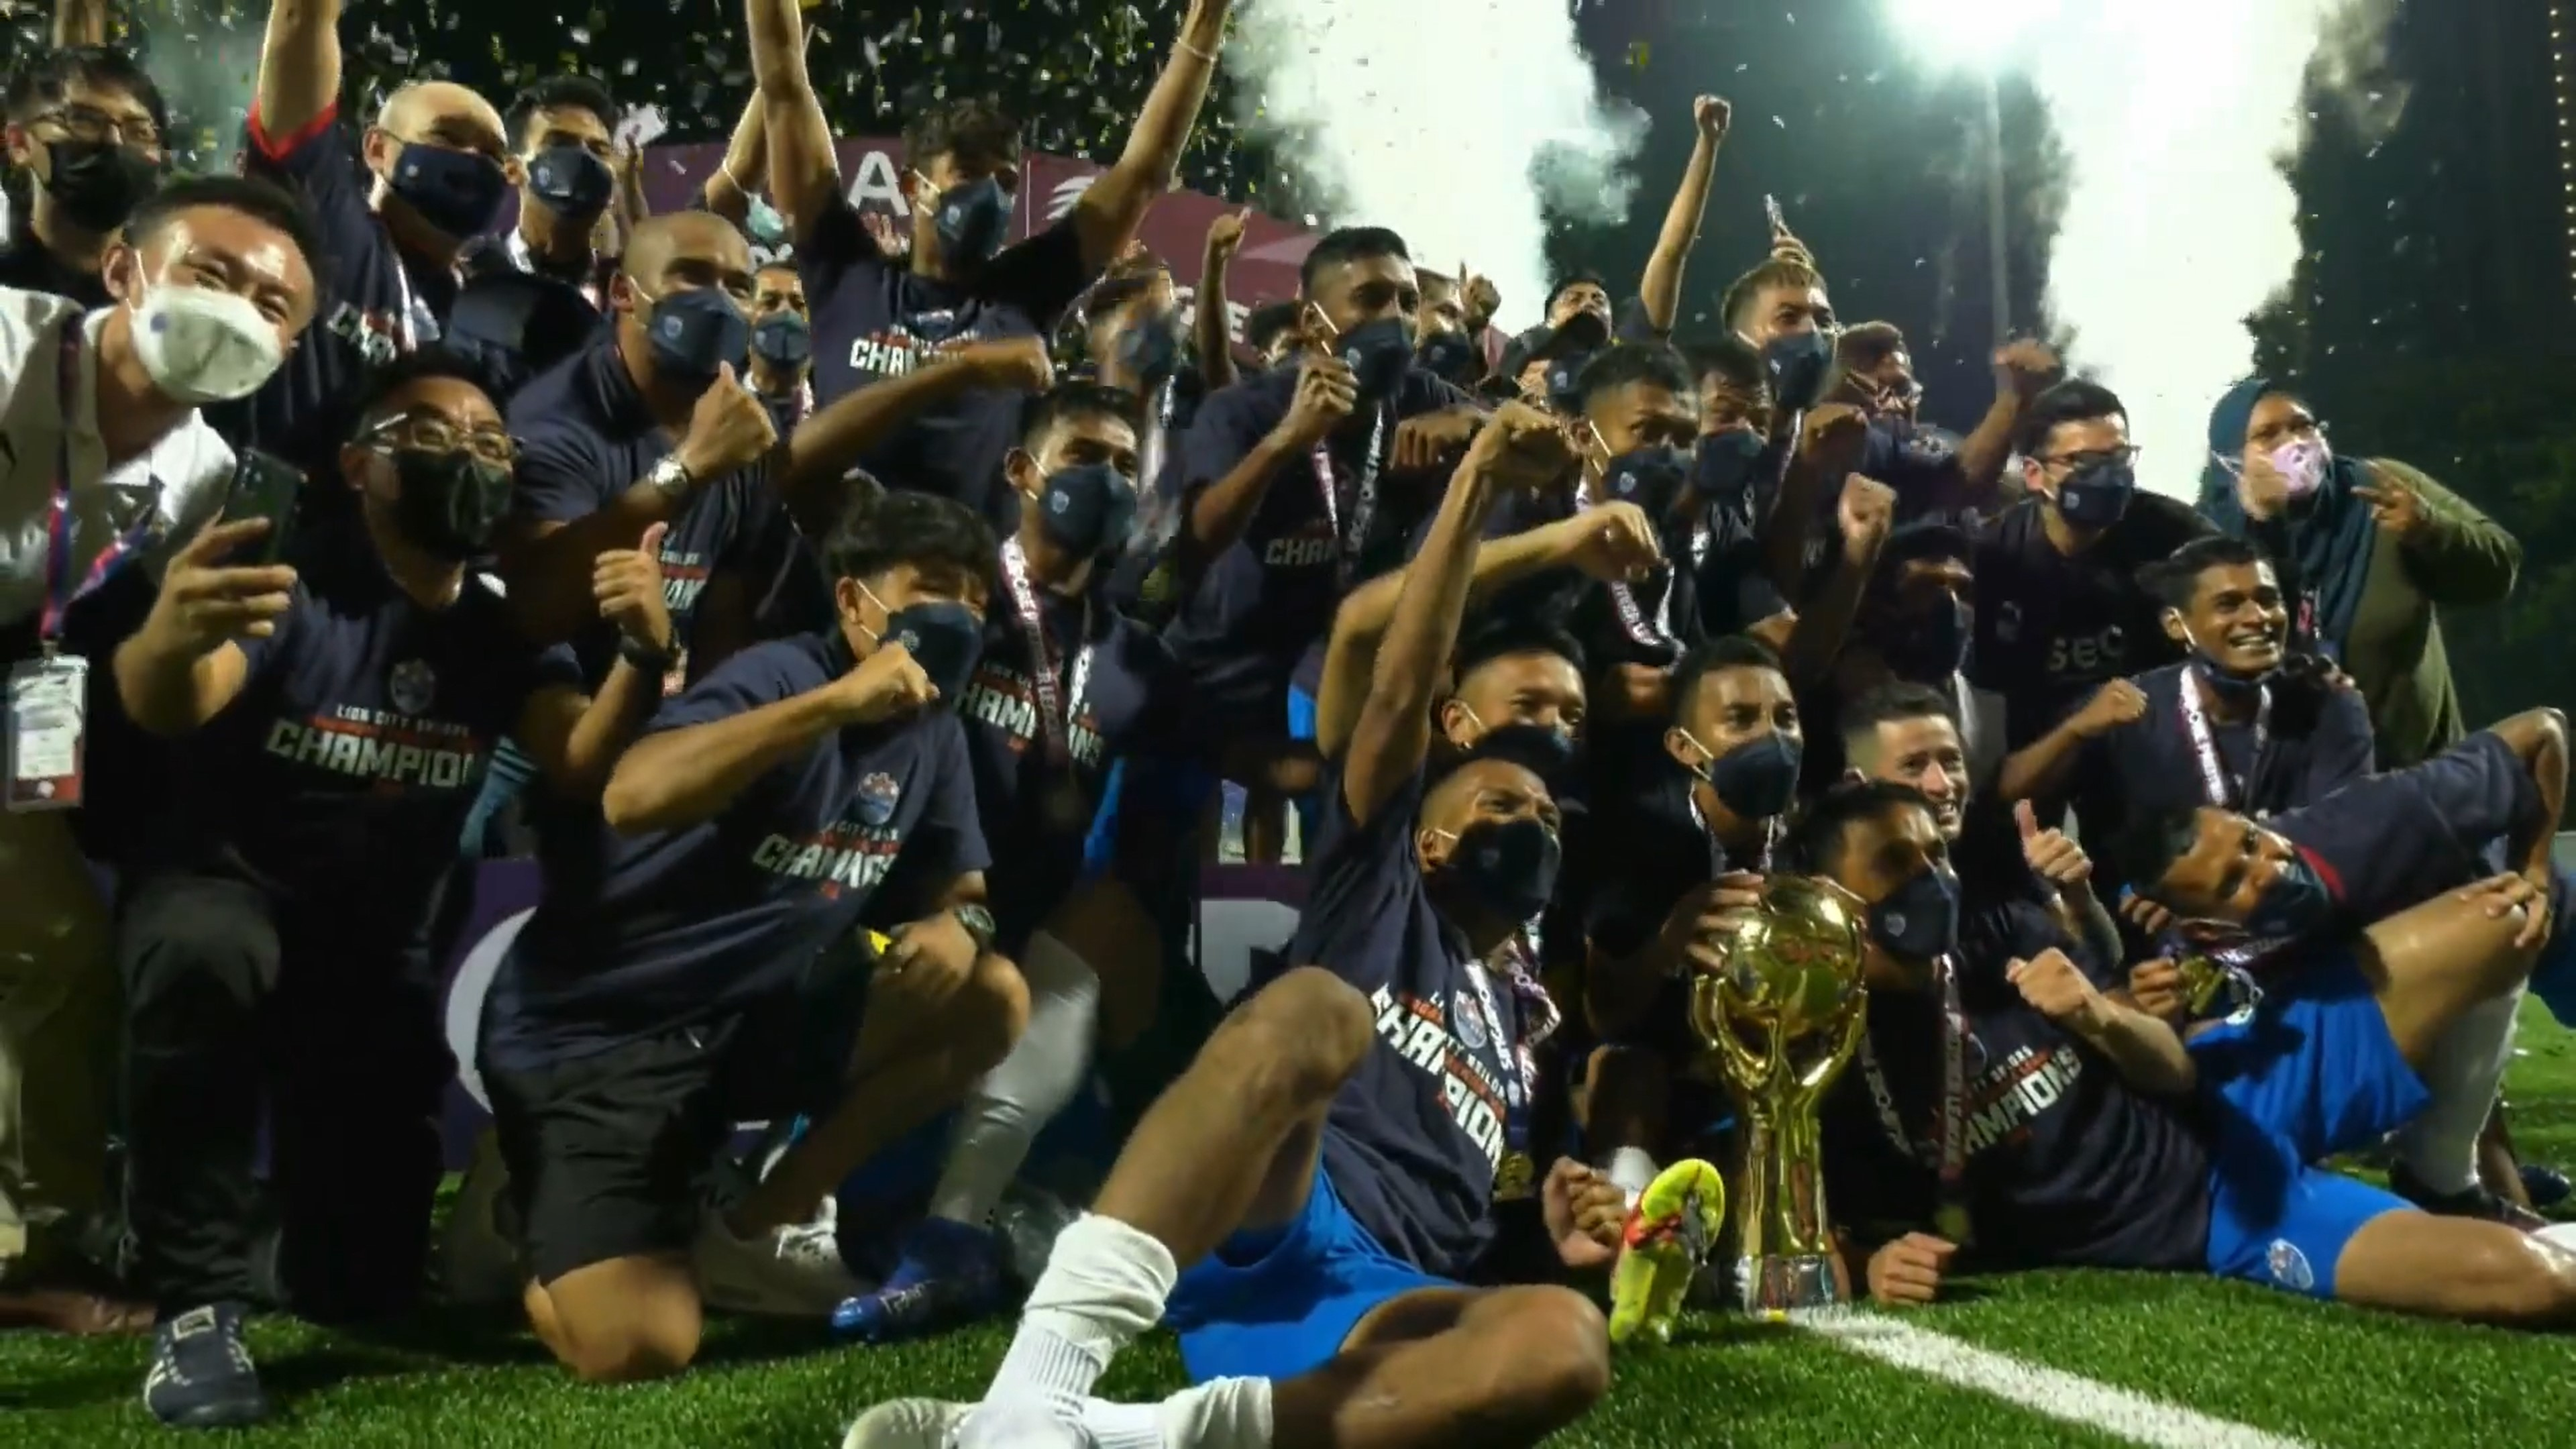 SPL : Resilient Lion City Sailors thrash Balestier Tigers 4-1 to win their 1st league trophy!